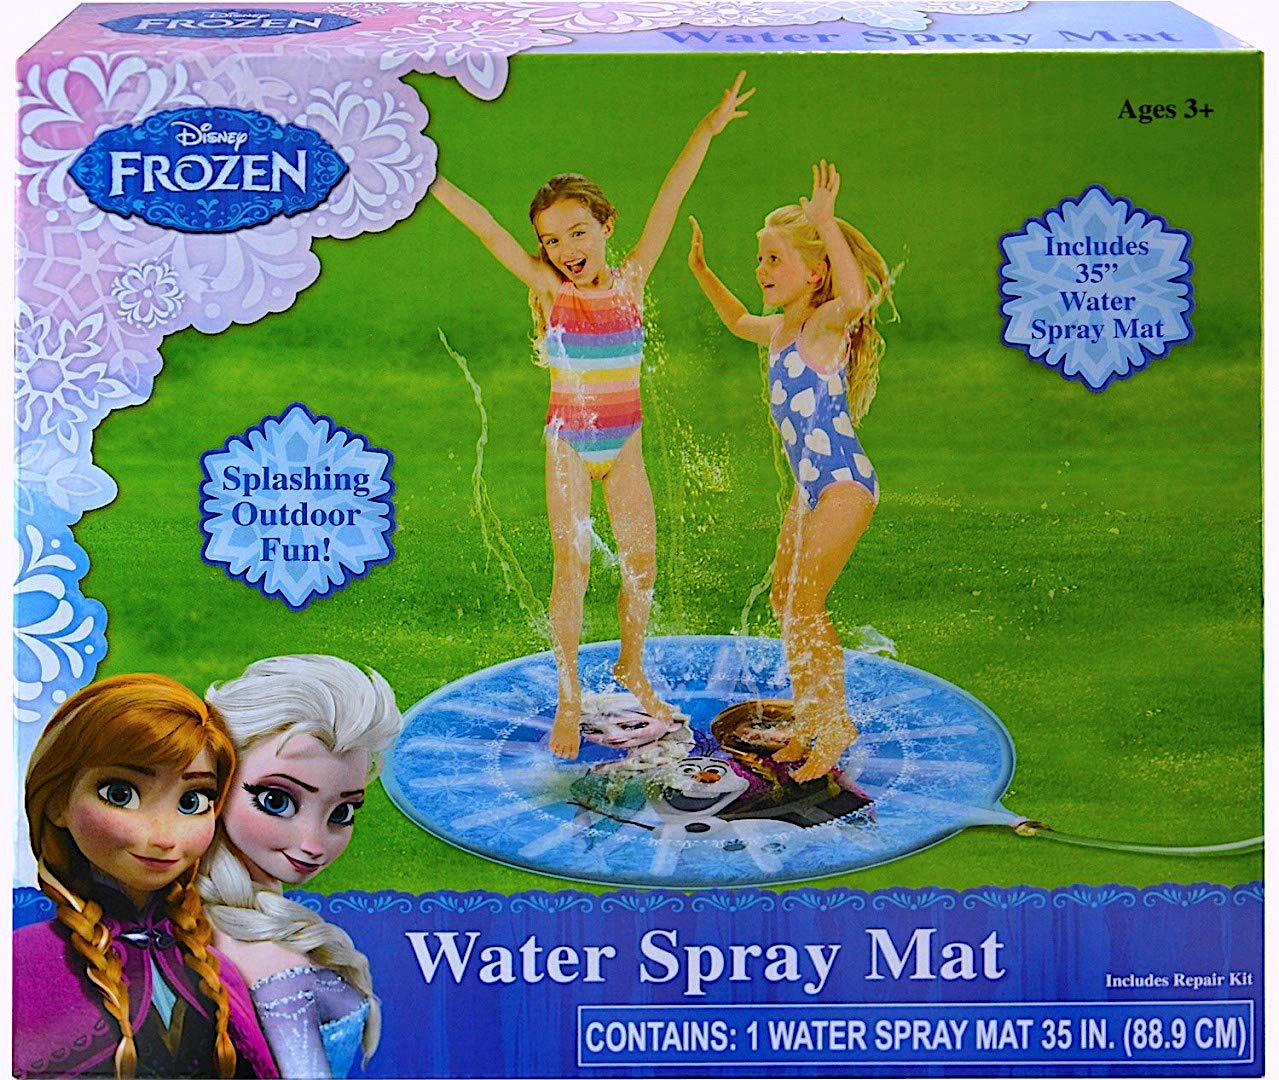 Disney Frozen Water Spray Mat 35'' Splashing Outdoor Fun